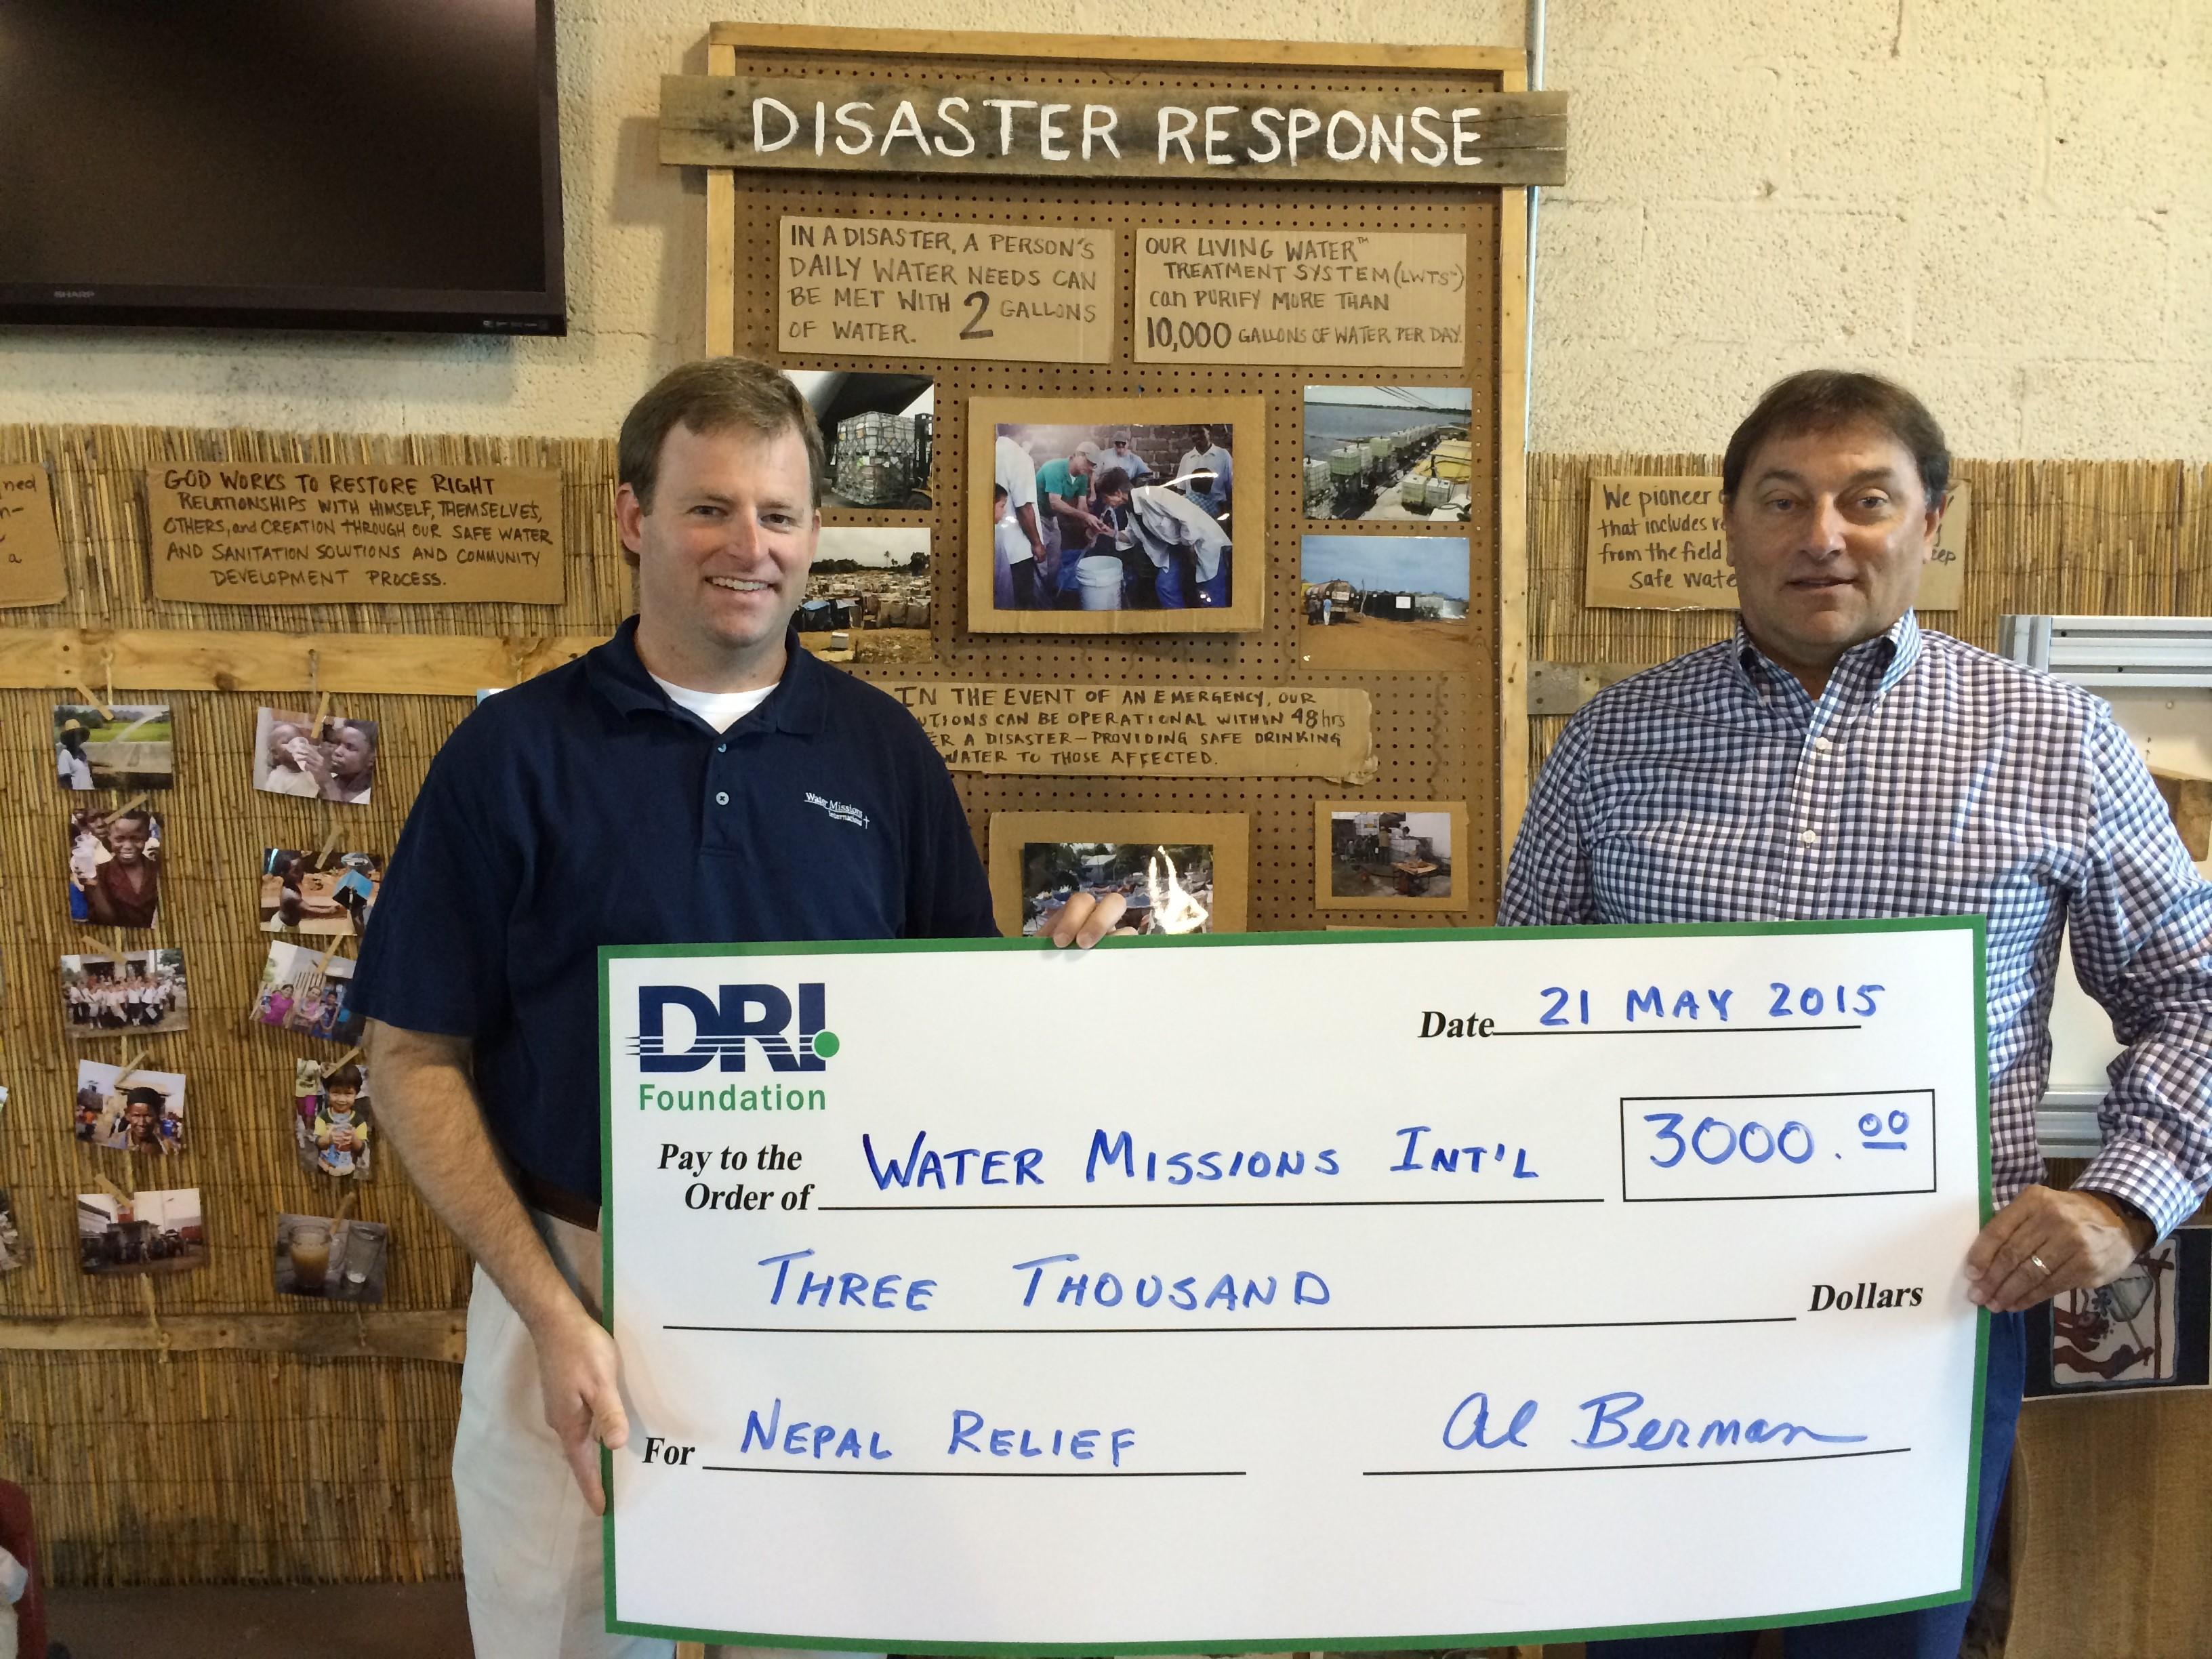 DRI Foundation - Water Missions Donation